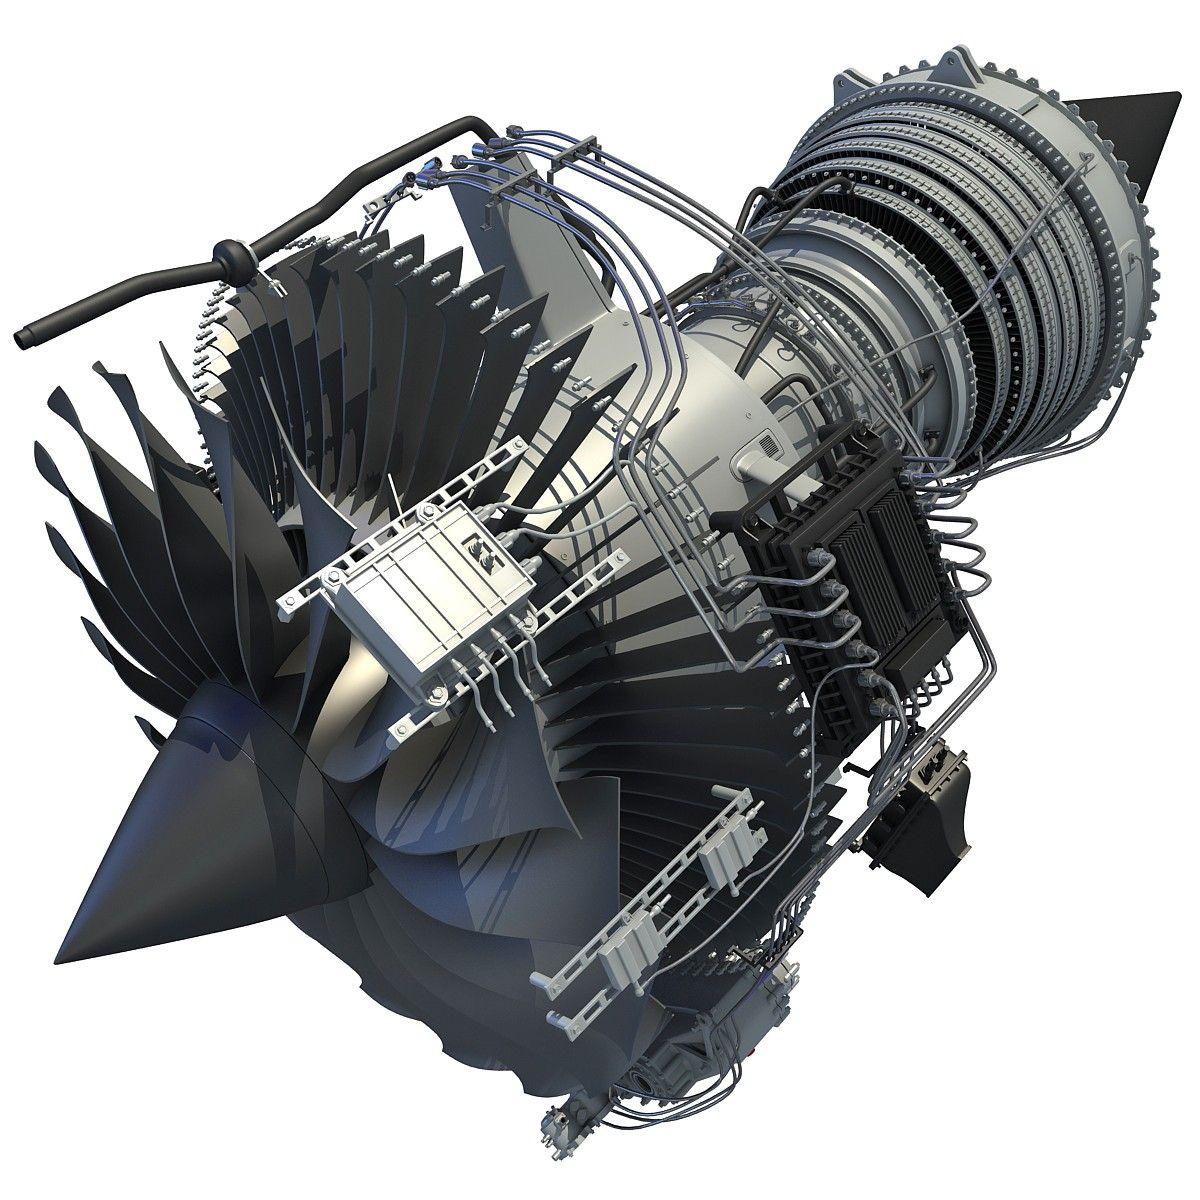 Mini Turboprop Engine: 3D Aircraft Jet Turbofan Engine Model